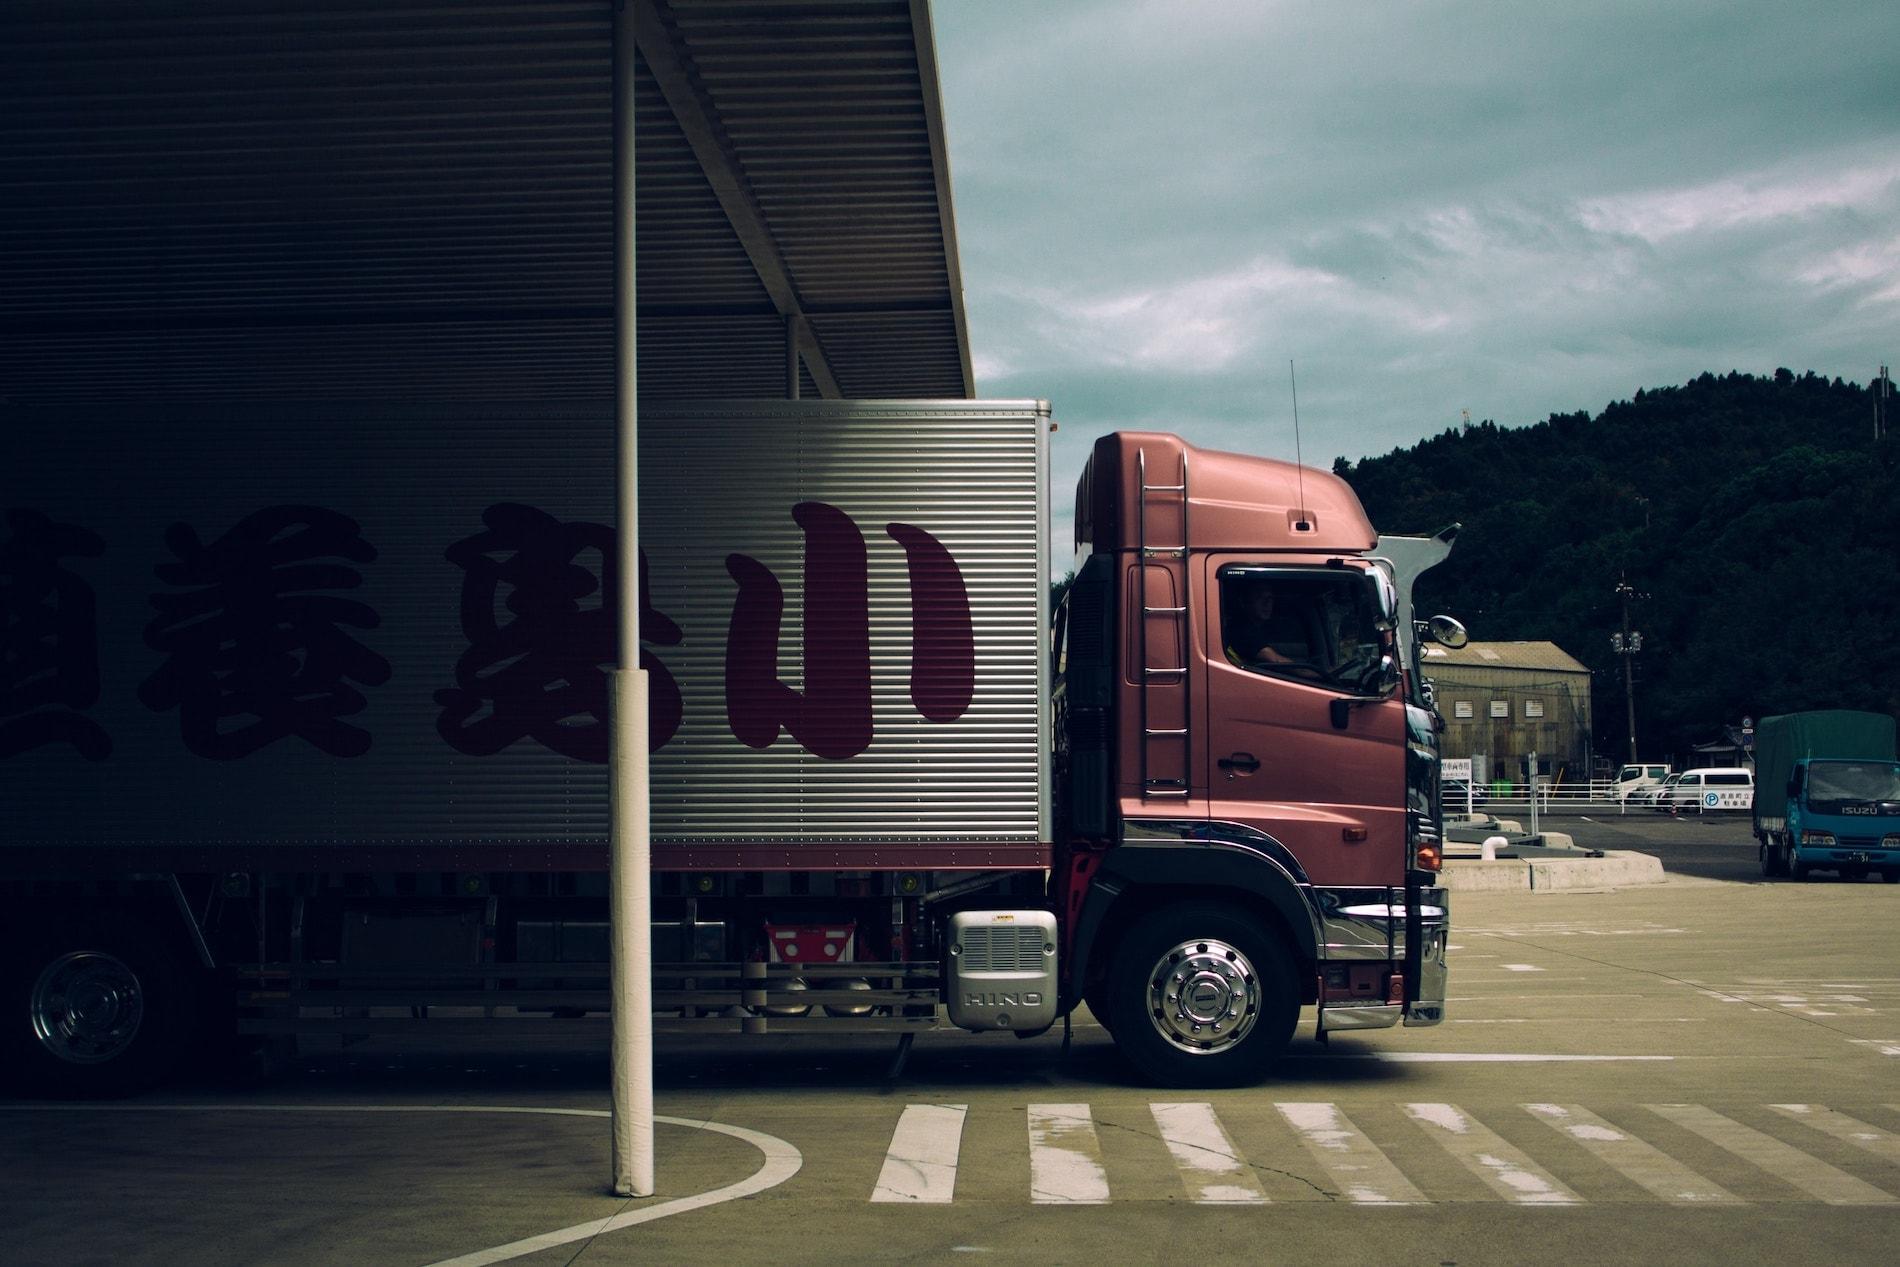 Truck leaving depot